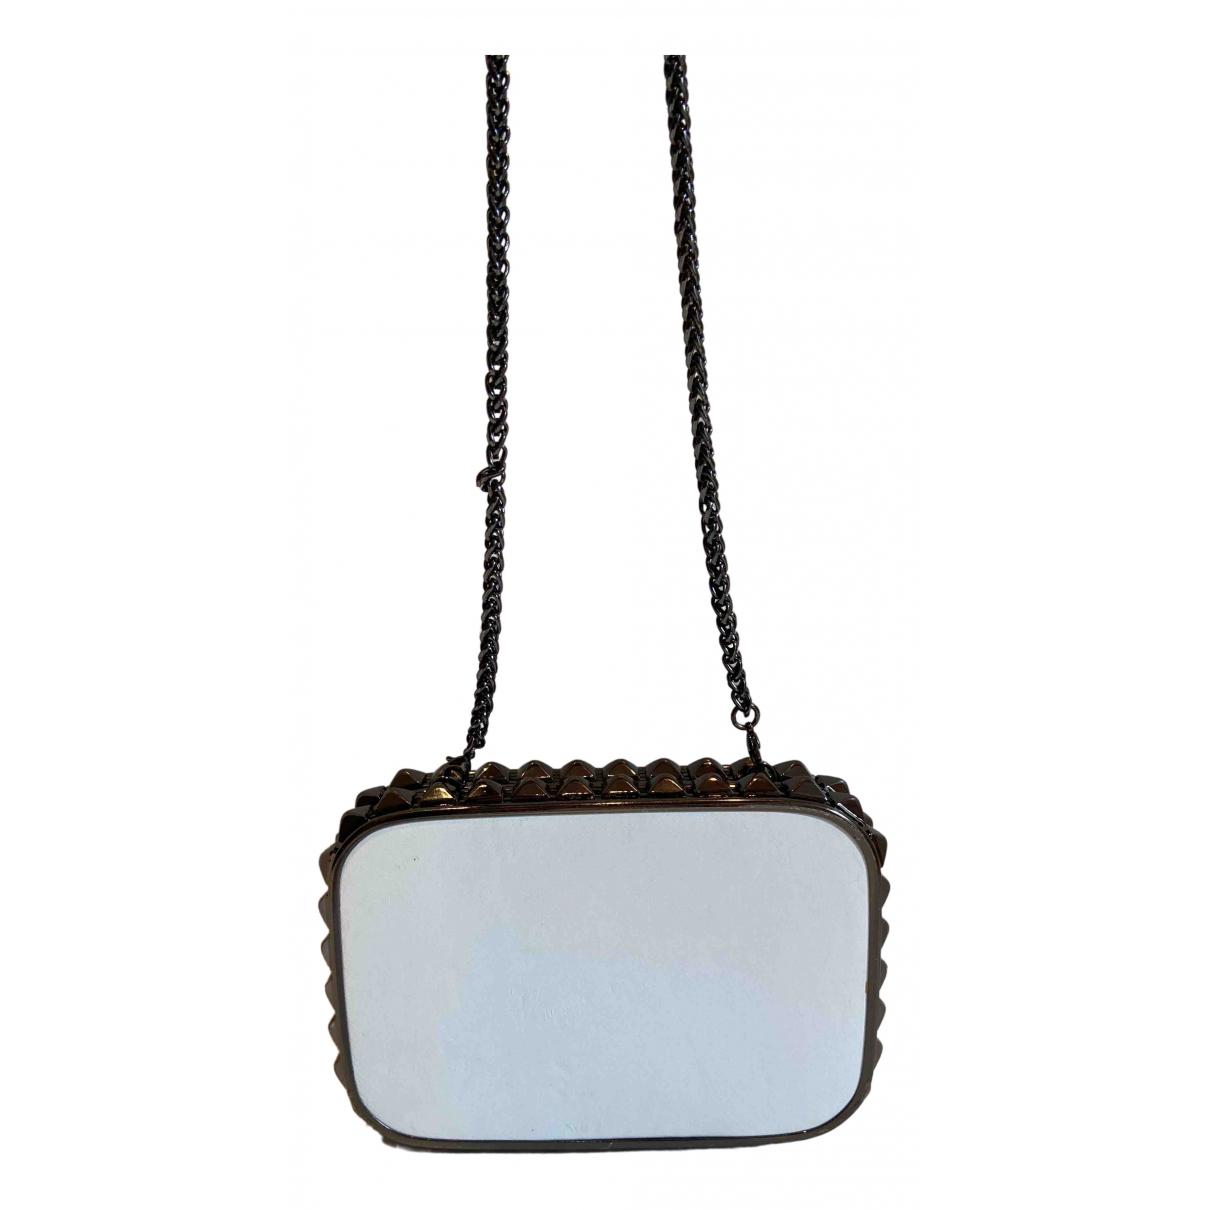 Barneys New York \N White Leather Clutch bag for Women \N